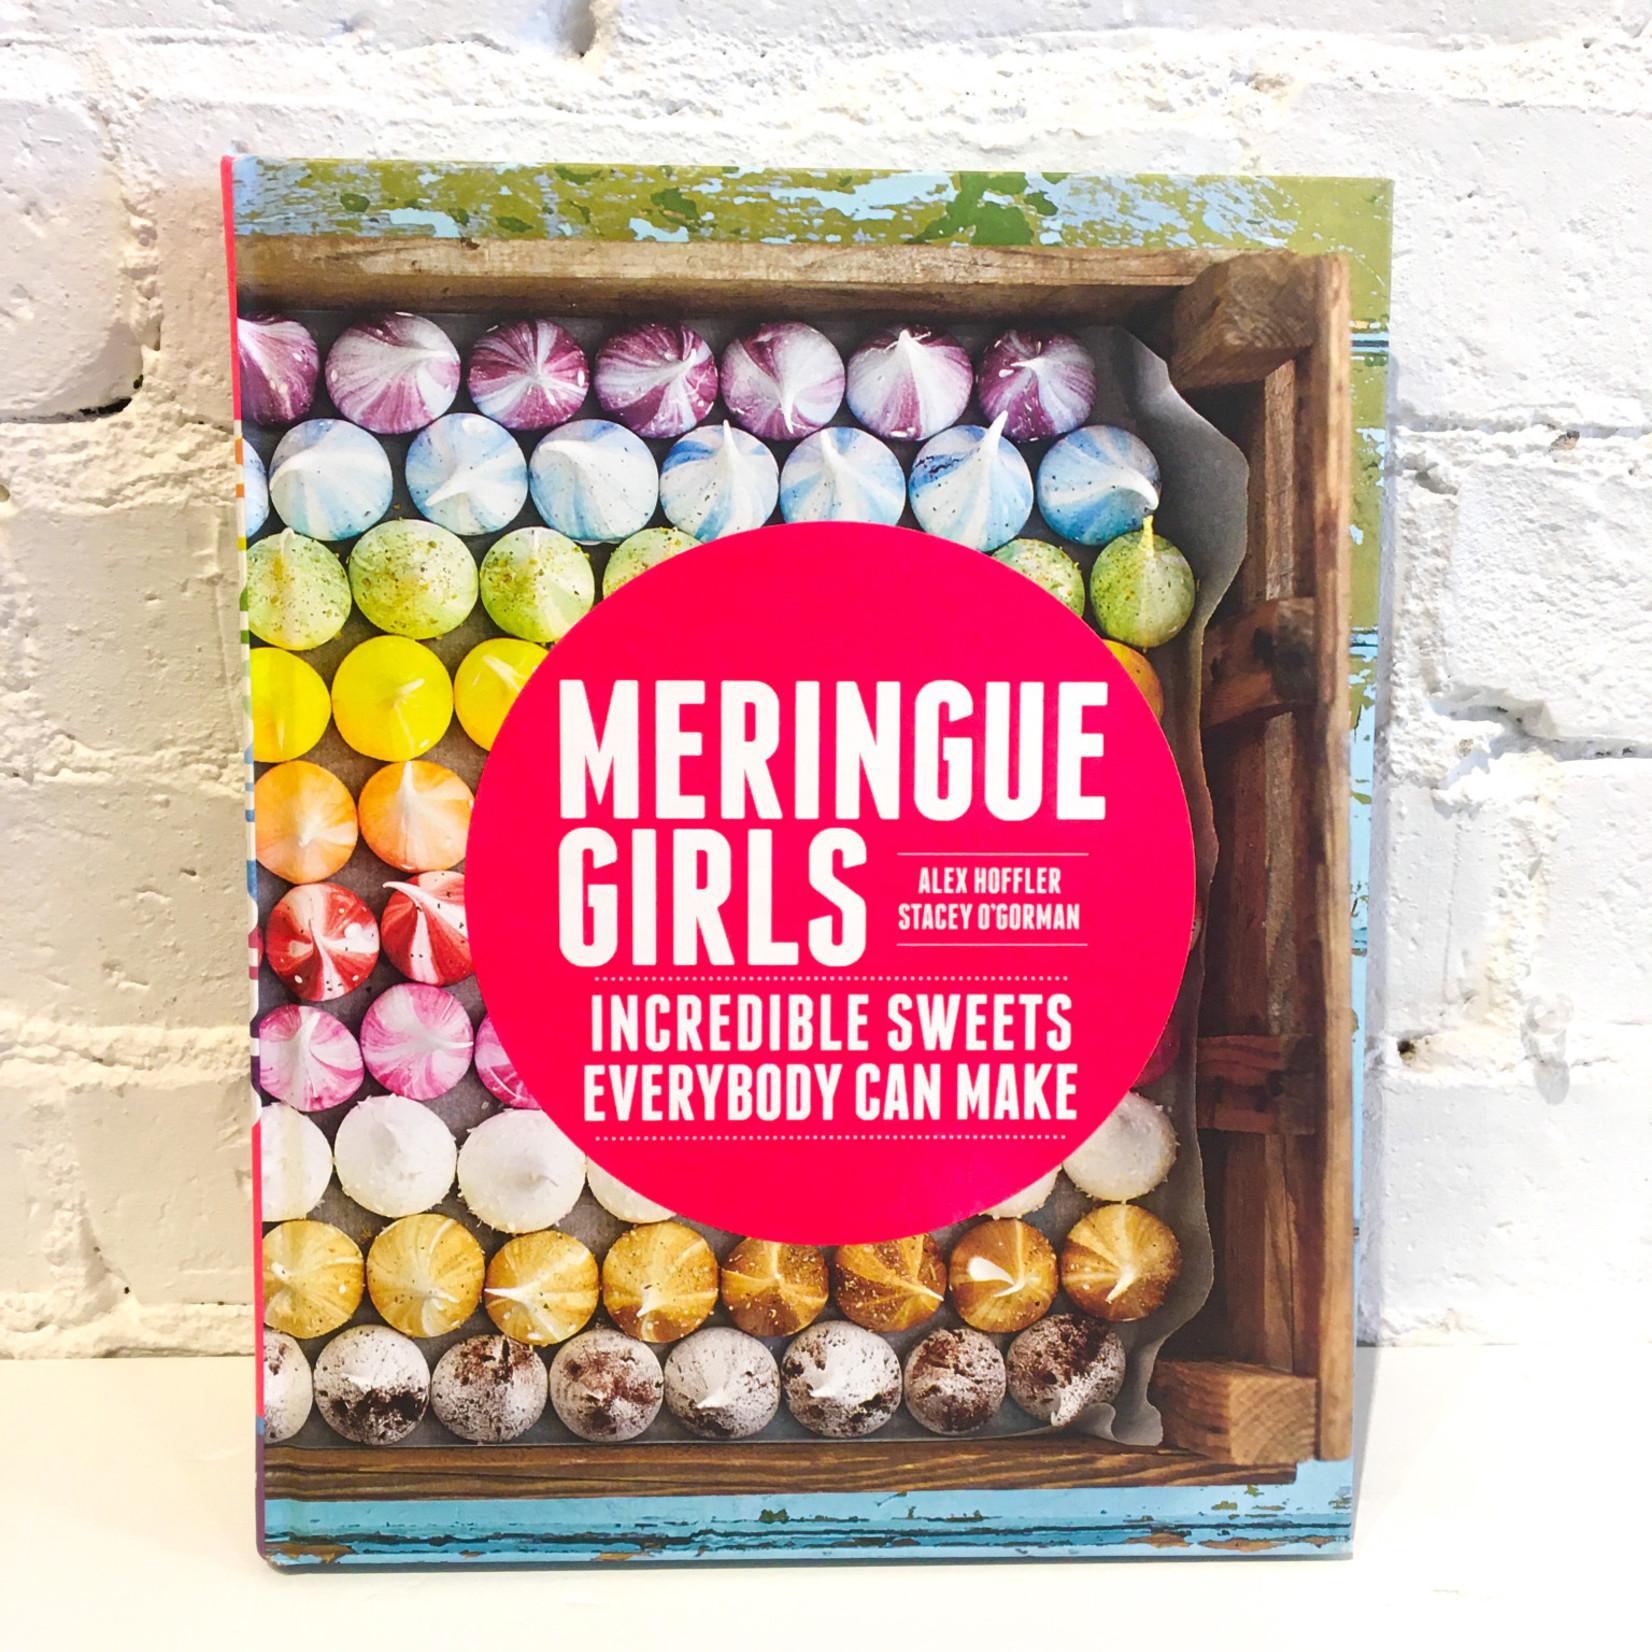 Meringue Girls by Alex Hoffler & Stacey O'Gorman